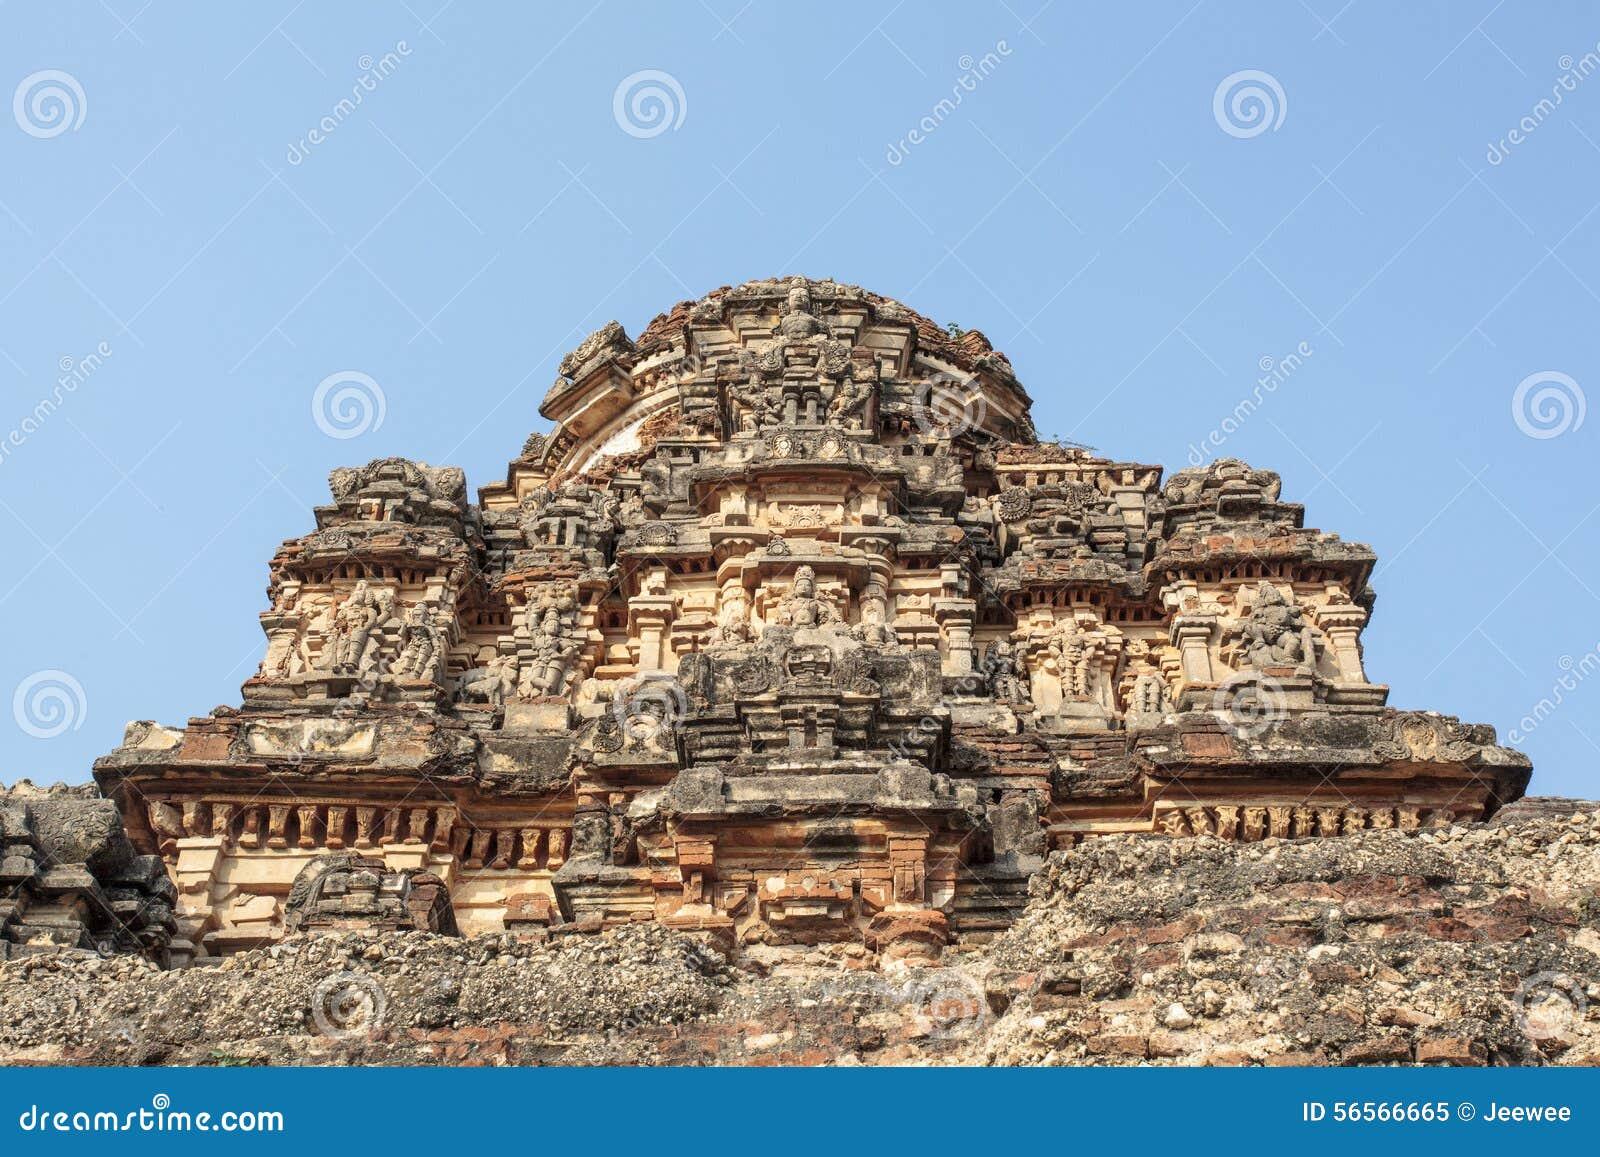 Download Μέσα στον ινδό ναό Vittala στην αρχαία περιοχή Hampi, Karnataka, Ινδία Στοκ Εικόνα - εικόνα από ancientness, ασία: 56566665